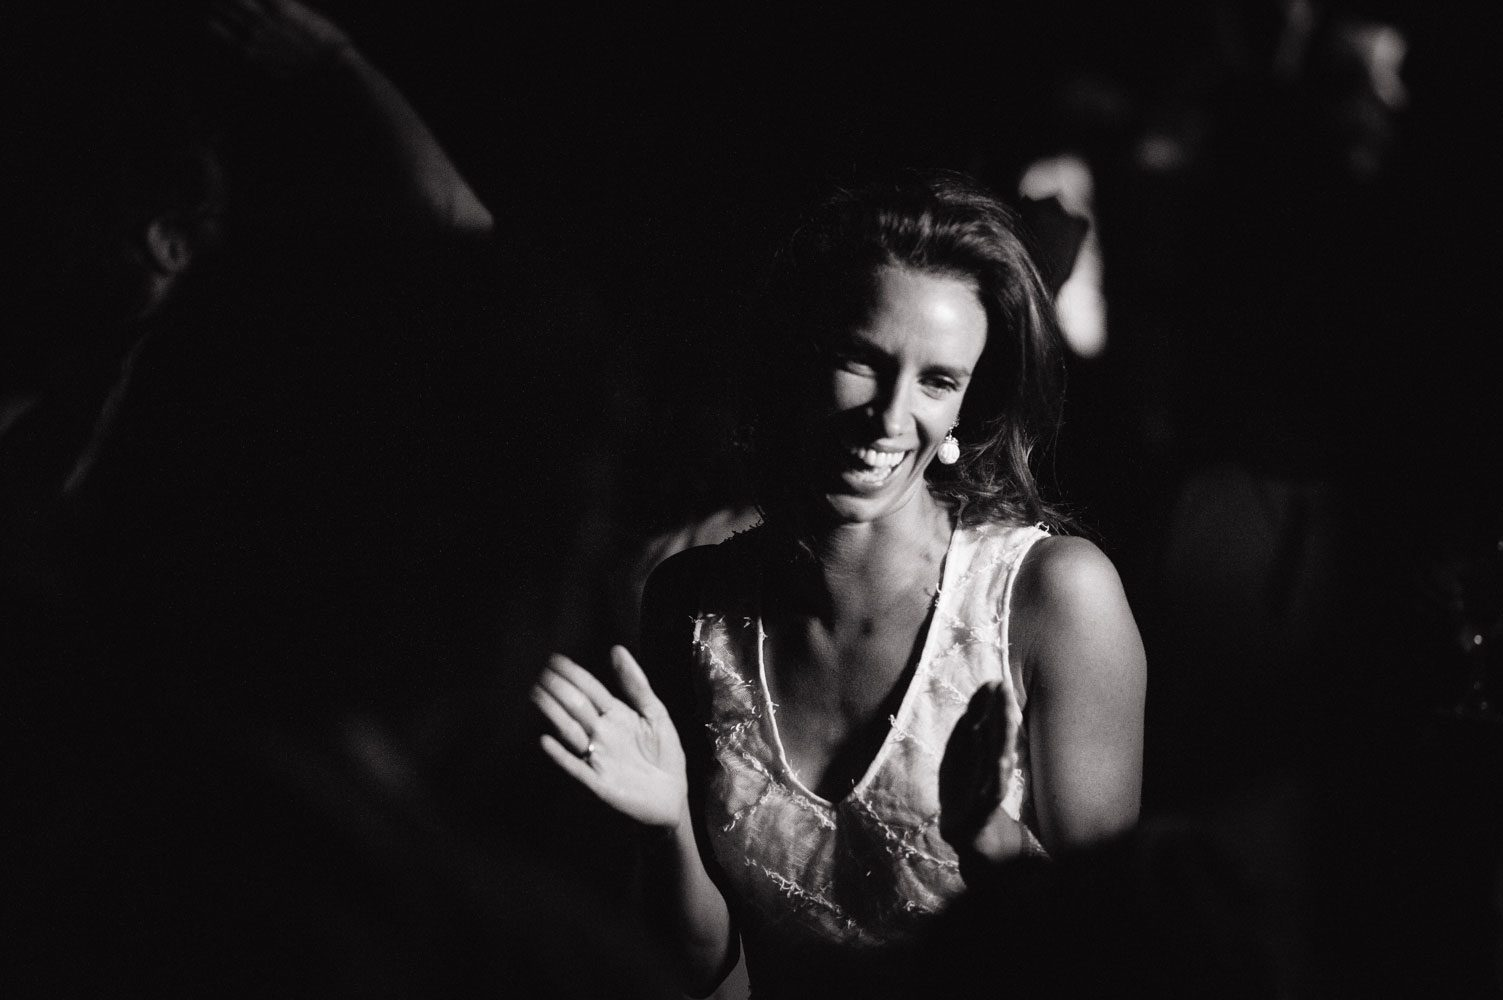 bride applauds at wedding in morocco